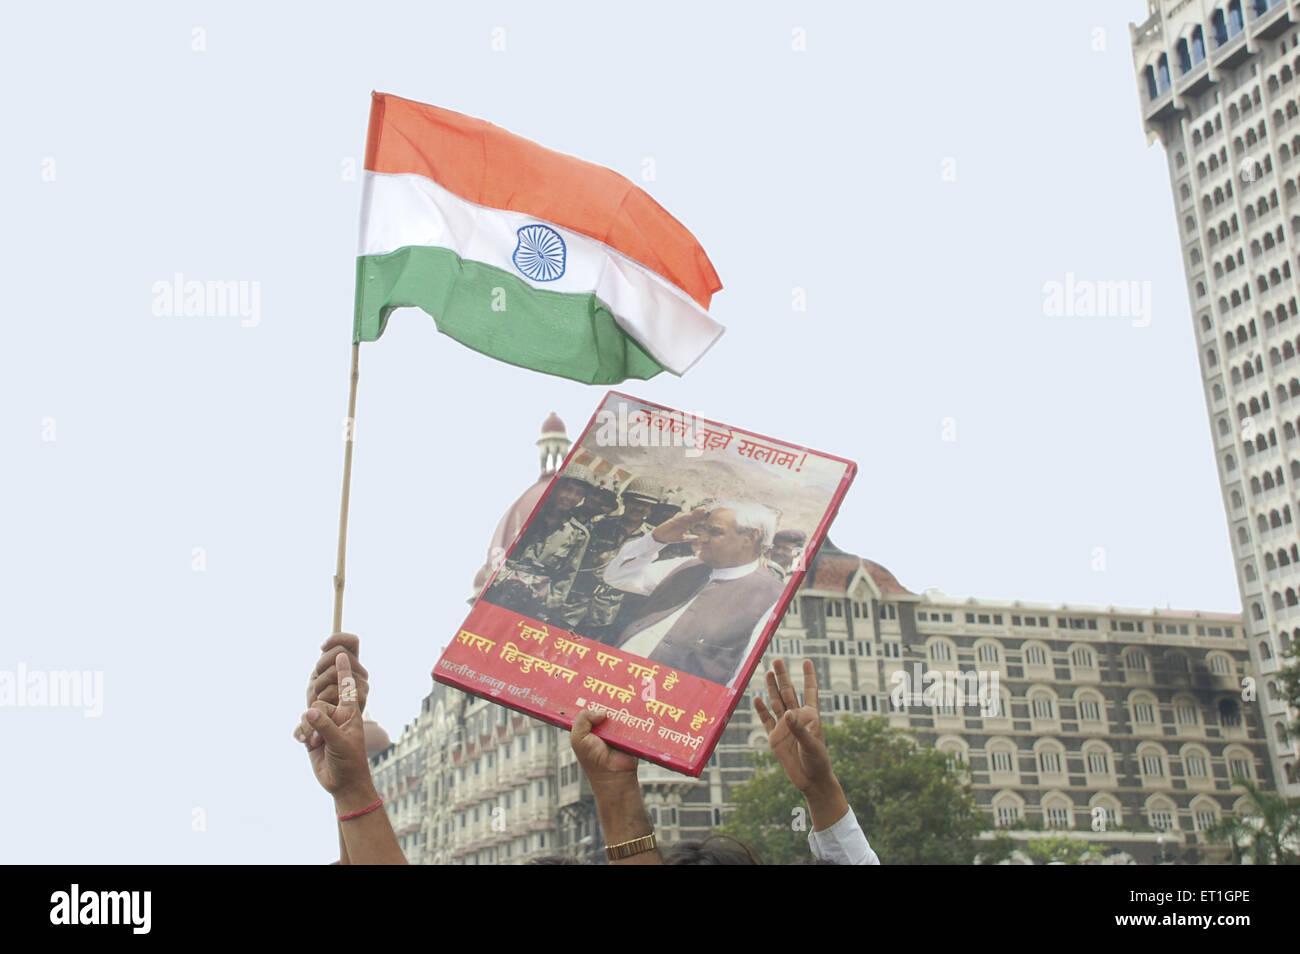 Protestors with banners outside taj mahal hotel after terrorist attack by deccan mujahideen ; Bombay Mumbai ; Maharashtra - Stock Image